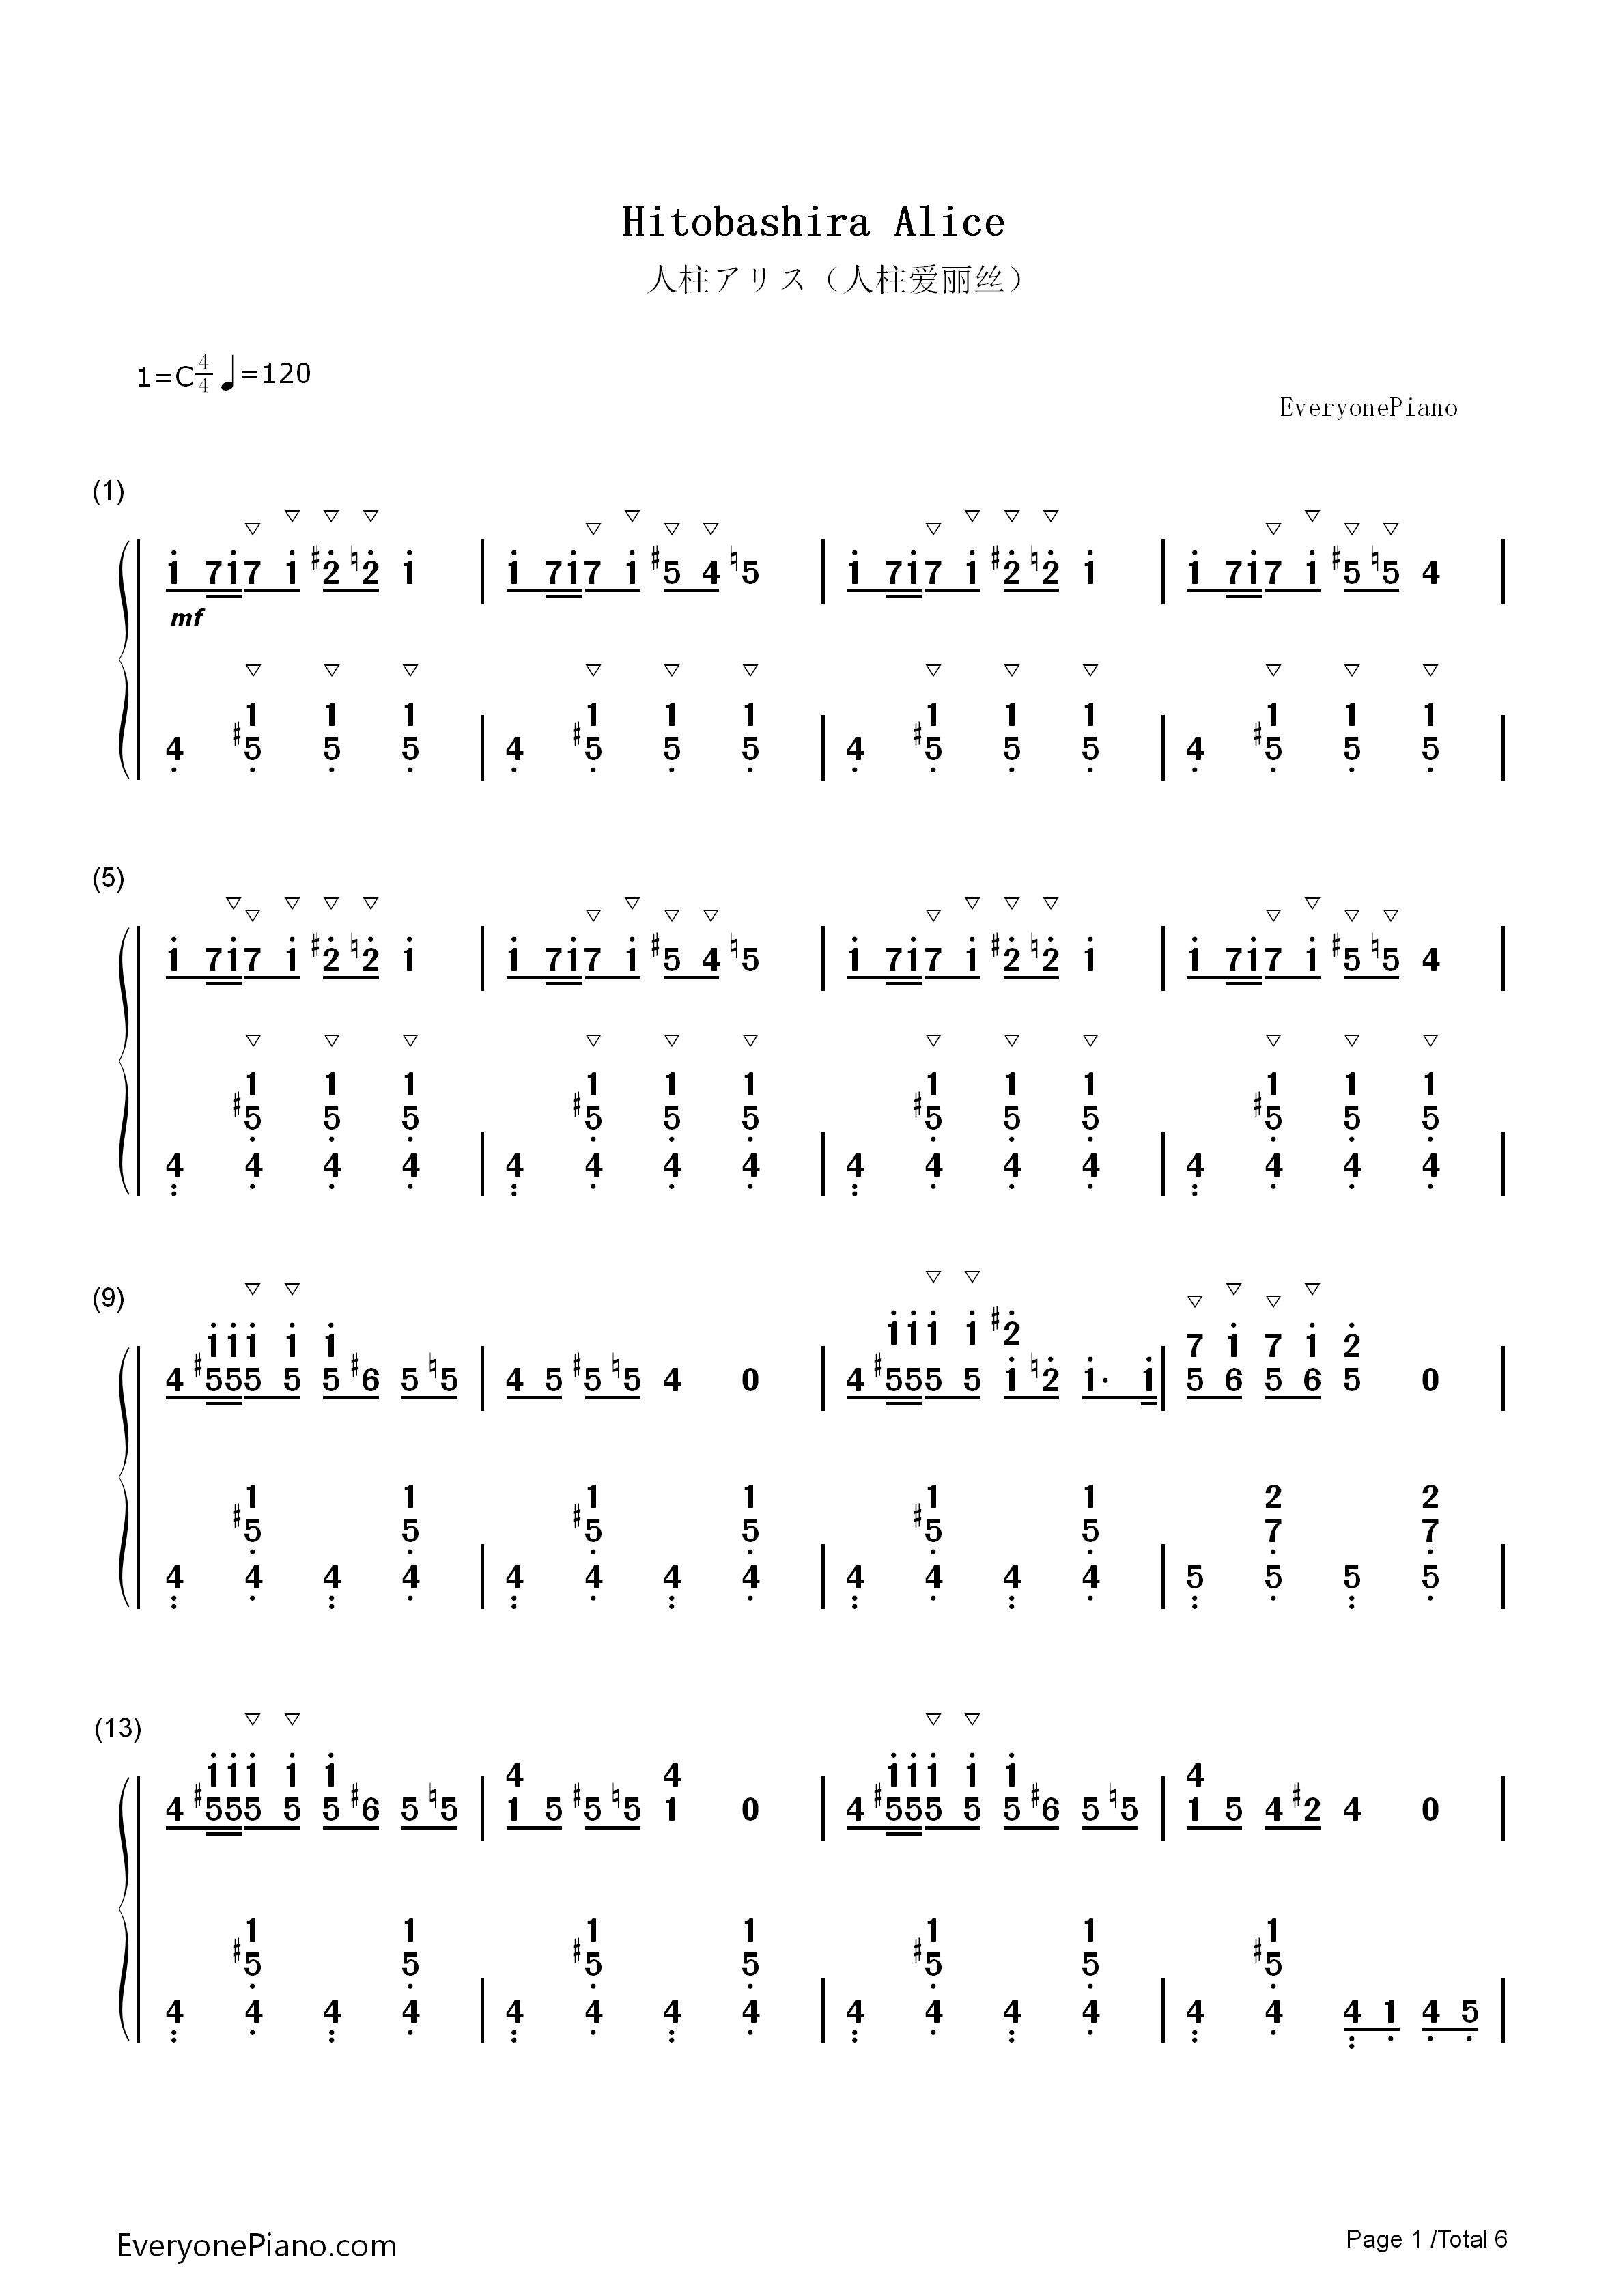 钢琴曲谱 动漫 人柱アリス(人柱爱丽丝)-歪p 人柱アリス(人柱爱丽丝)